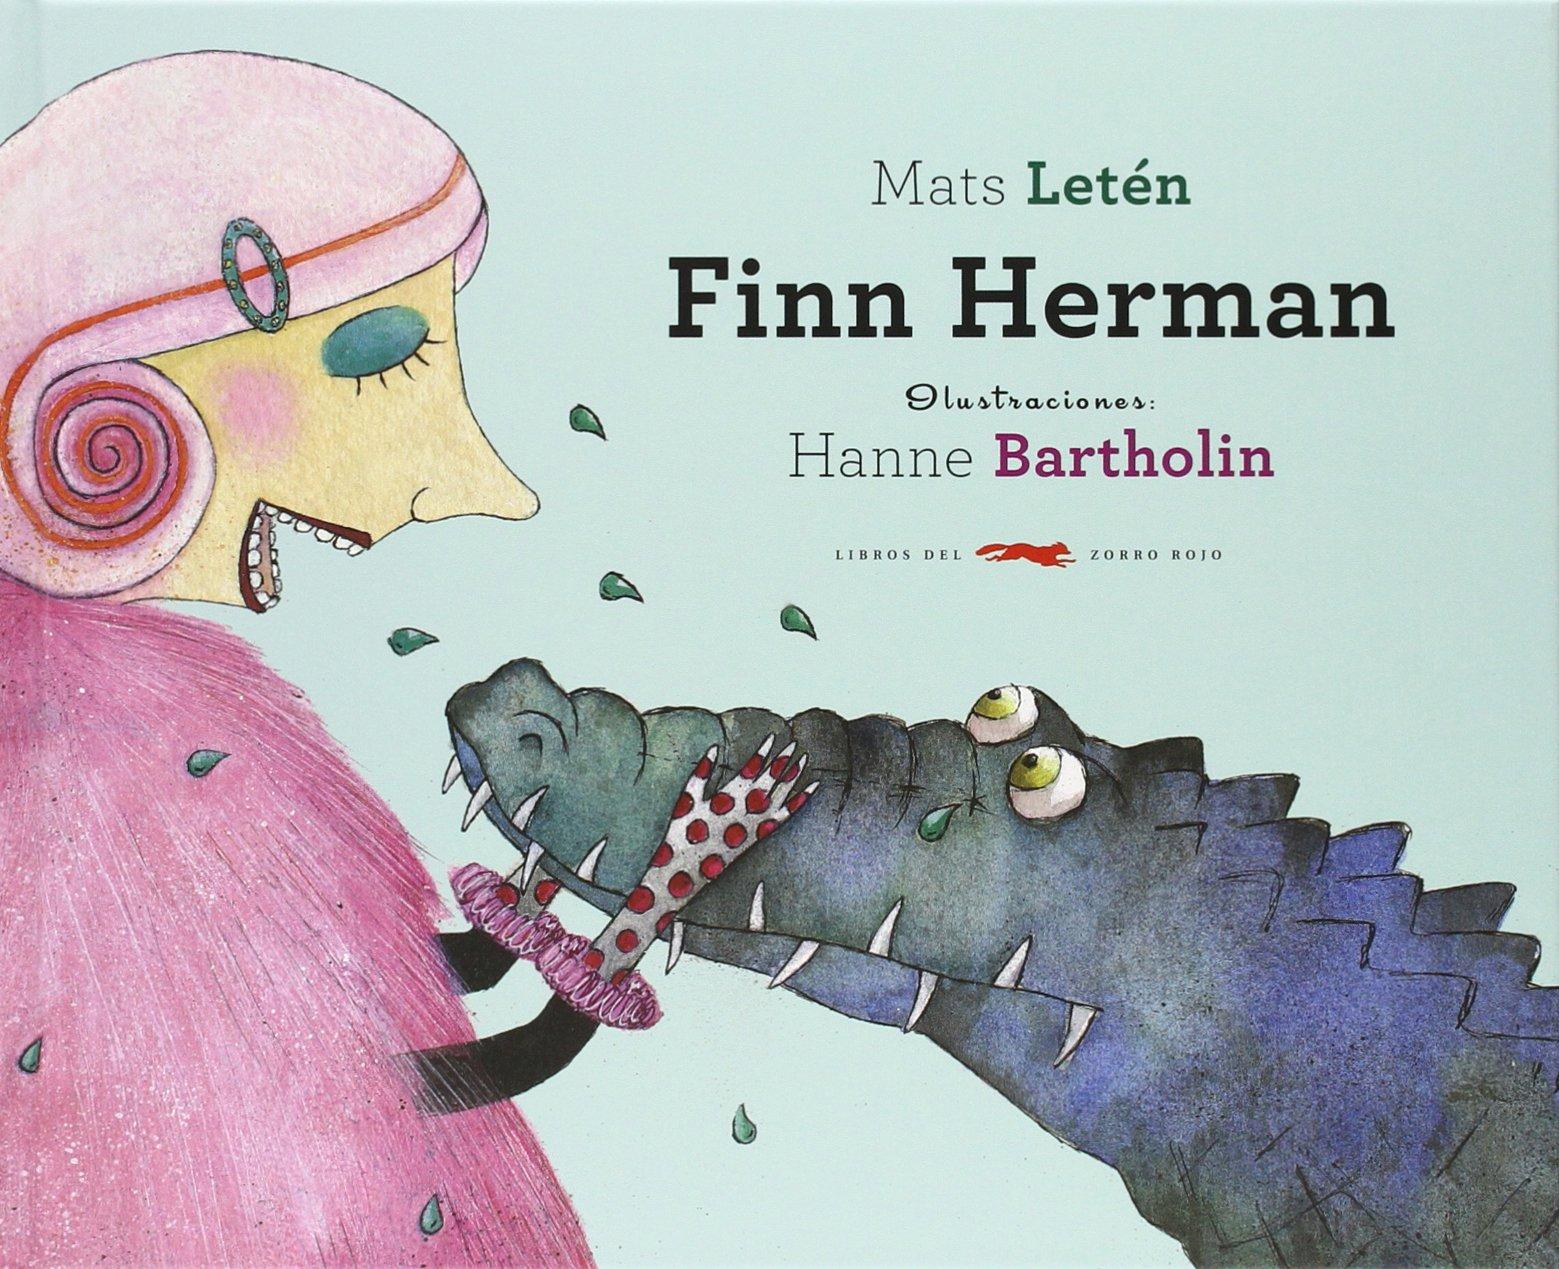 Finn Herman (ÁLBUMES ILUSTRADOS): Amazon.es: Letén, Mats, Bartholin, Hanne,  Ortiz Ostalé, Blanca: Libros